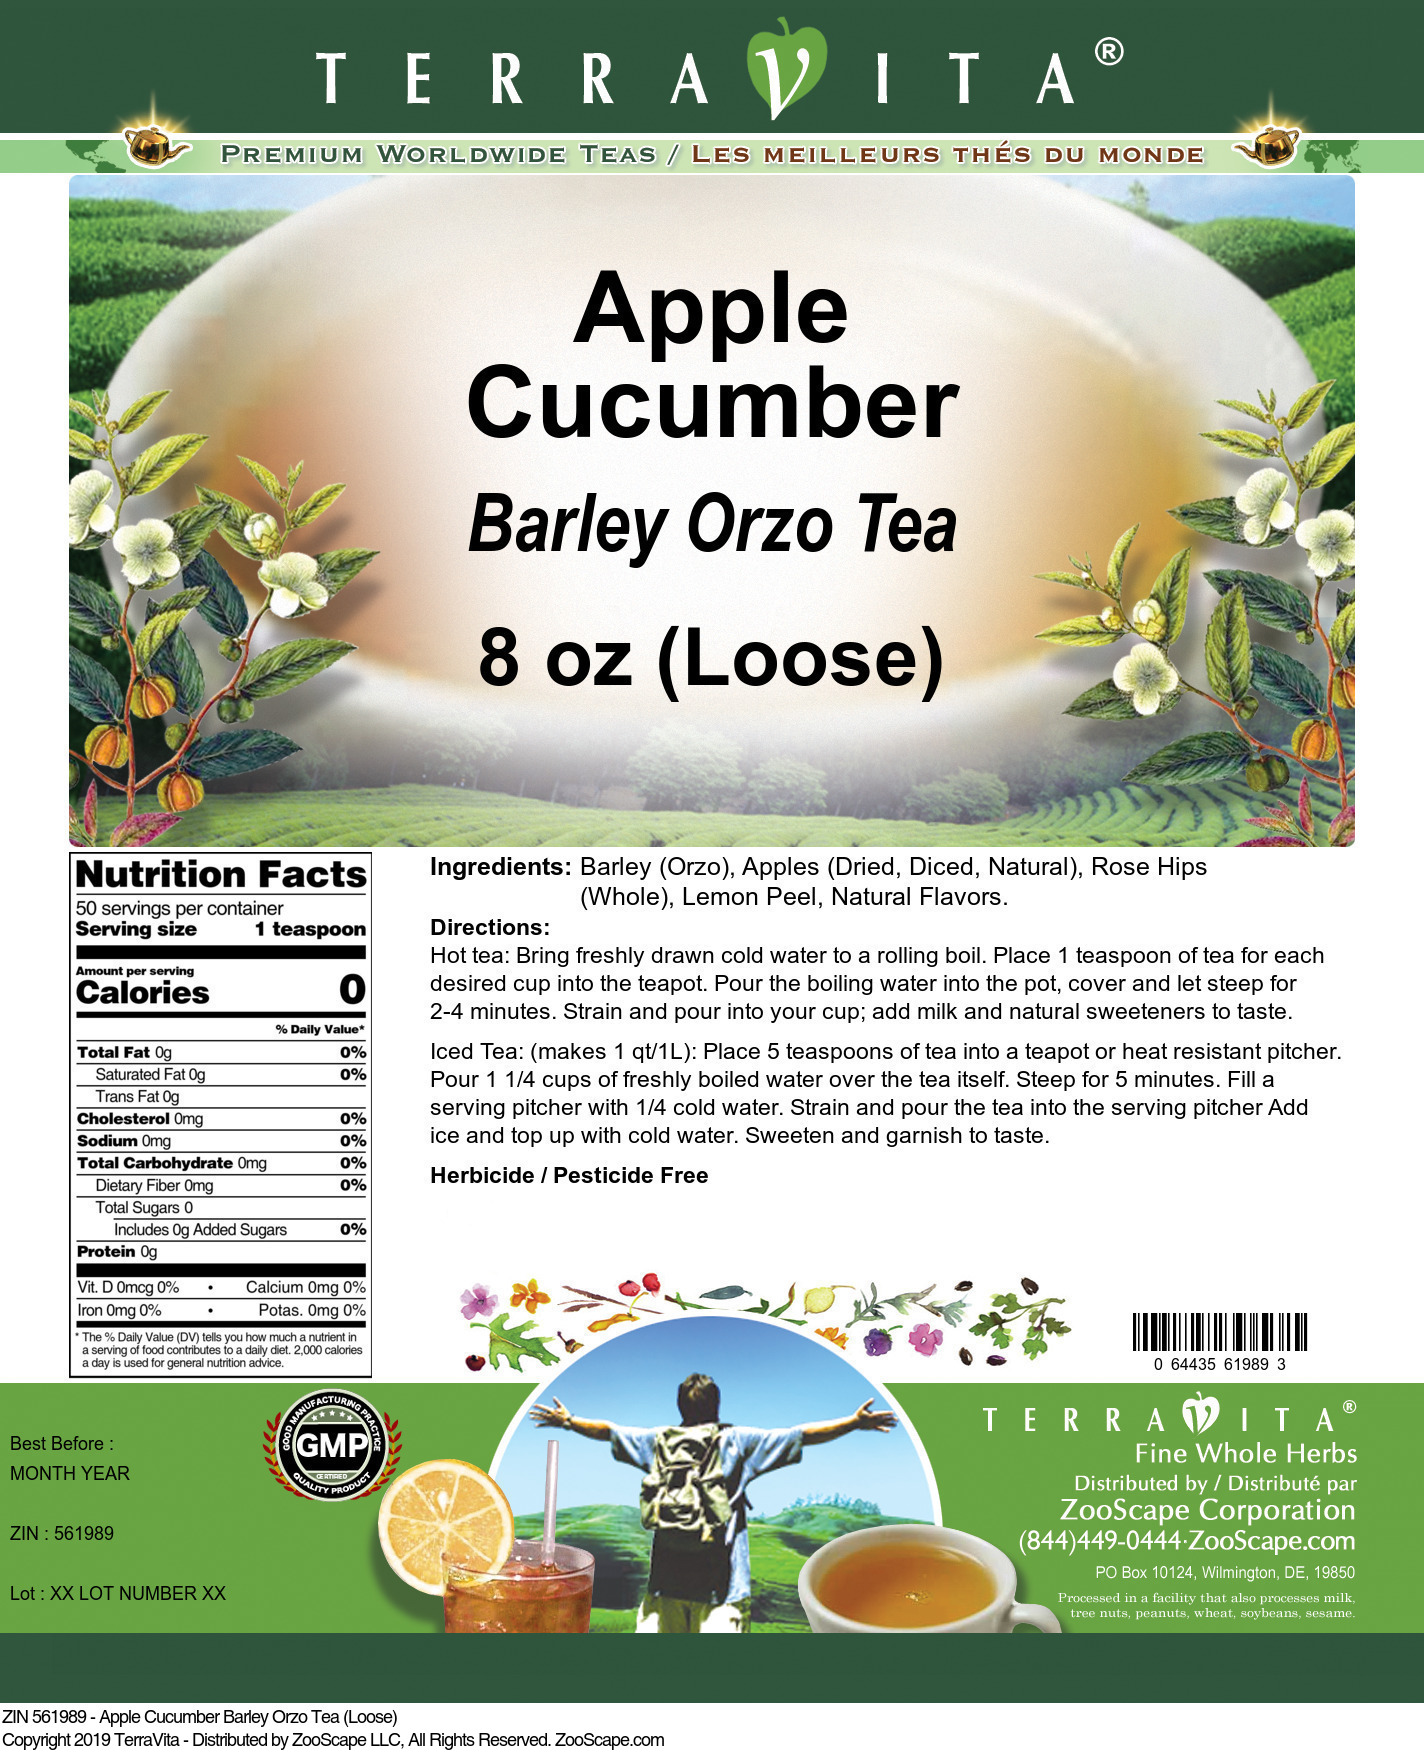 Apple Cucumber Barley Orzo Tea (Loose)